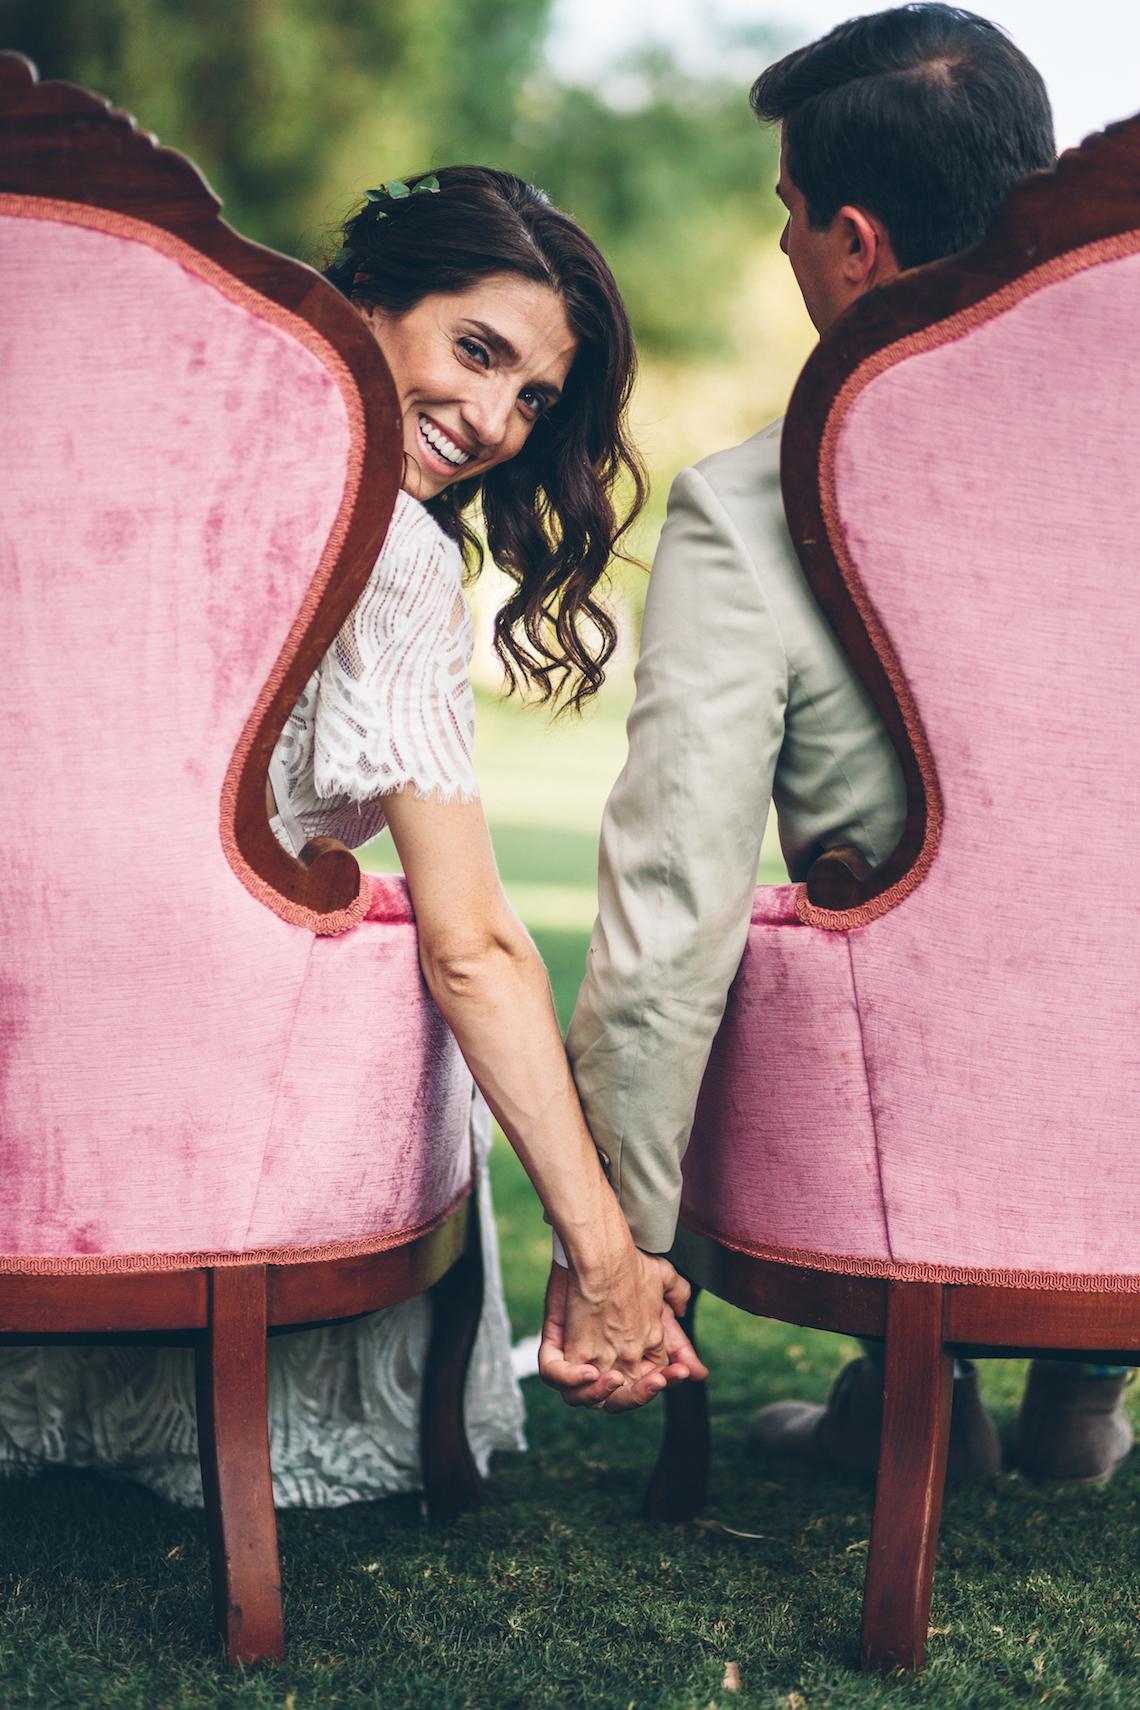 Rich & Rustic Malibu Mountains Ranch Wedding Inspiration | Vitae Weddings 18